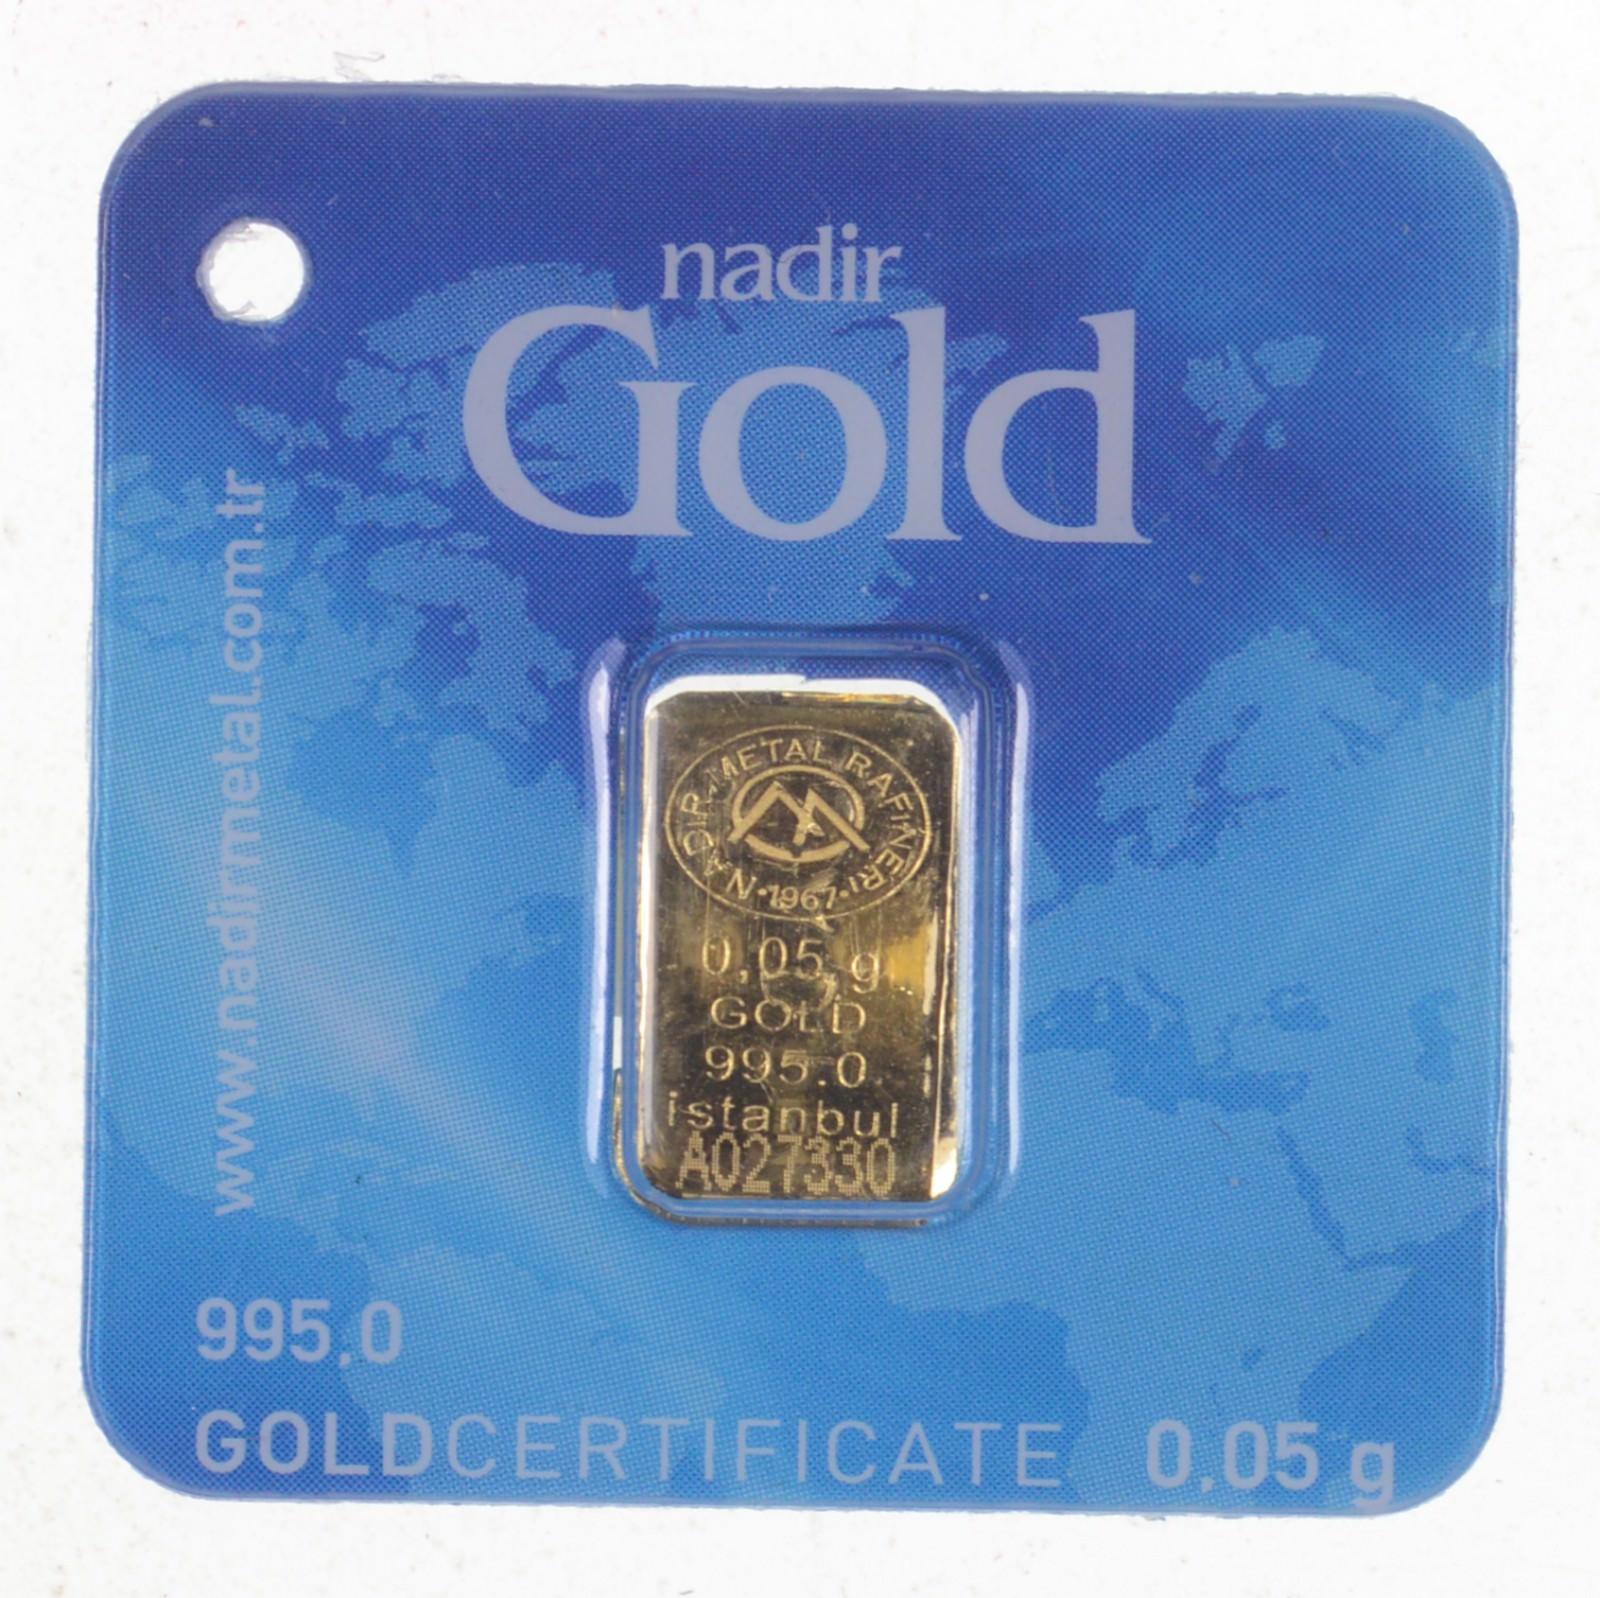 0 05 Gram 995 Nadir Gold Bar Istanbul Property Room